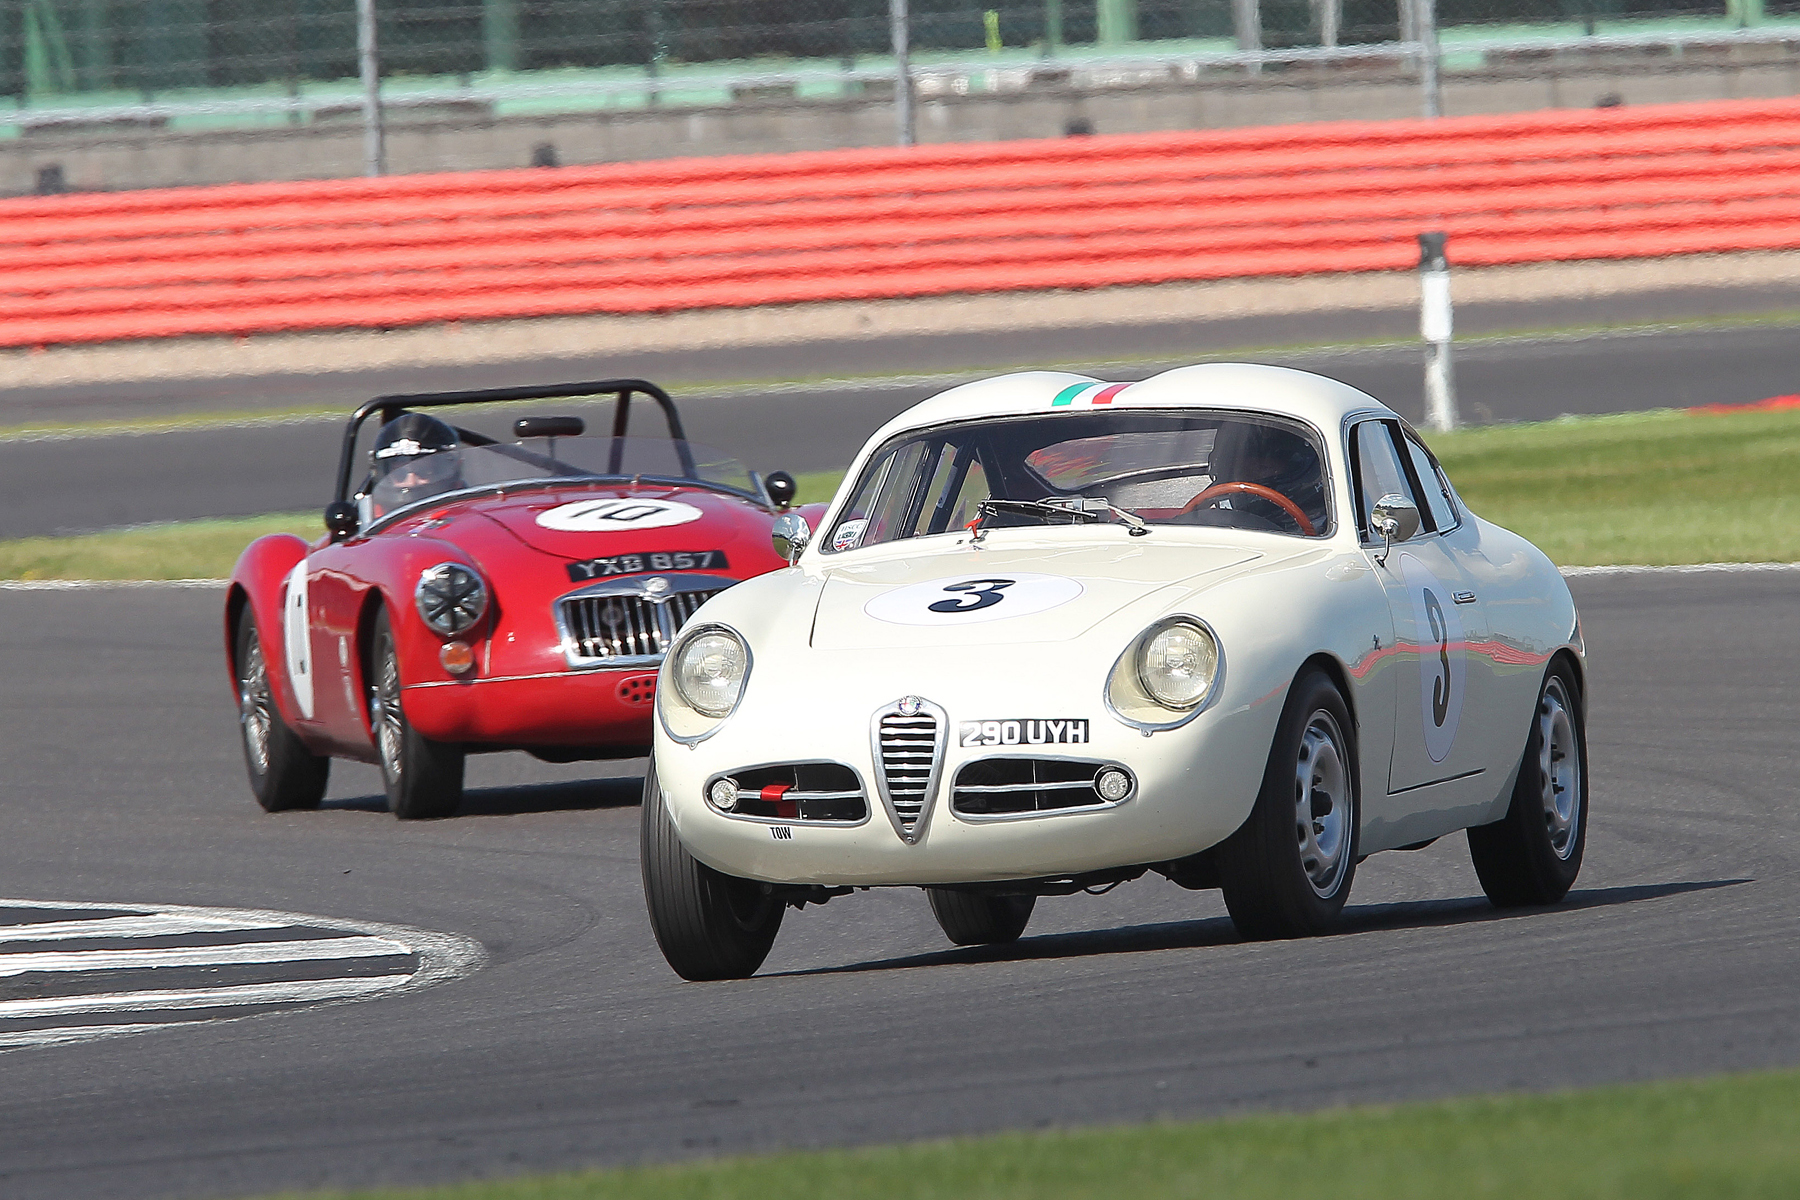 Brian Arculus presses on regardless in the misfiring Alfa Romeo. Photo - Mick Walker